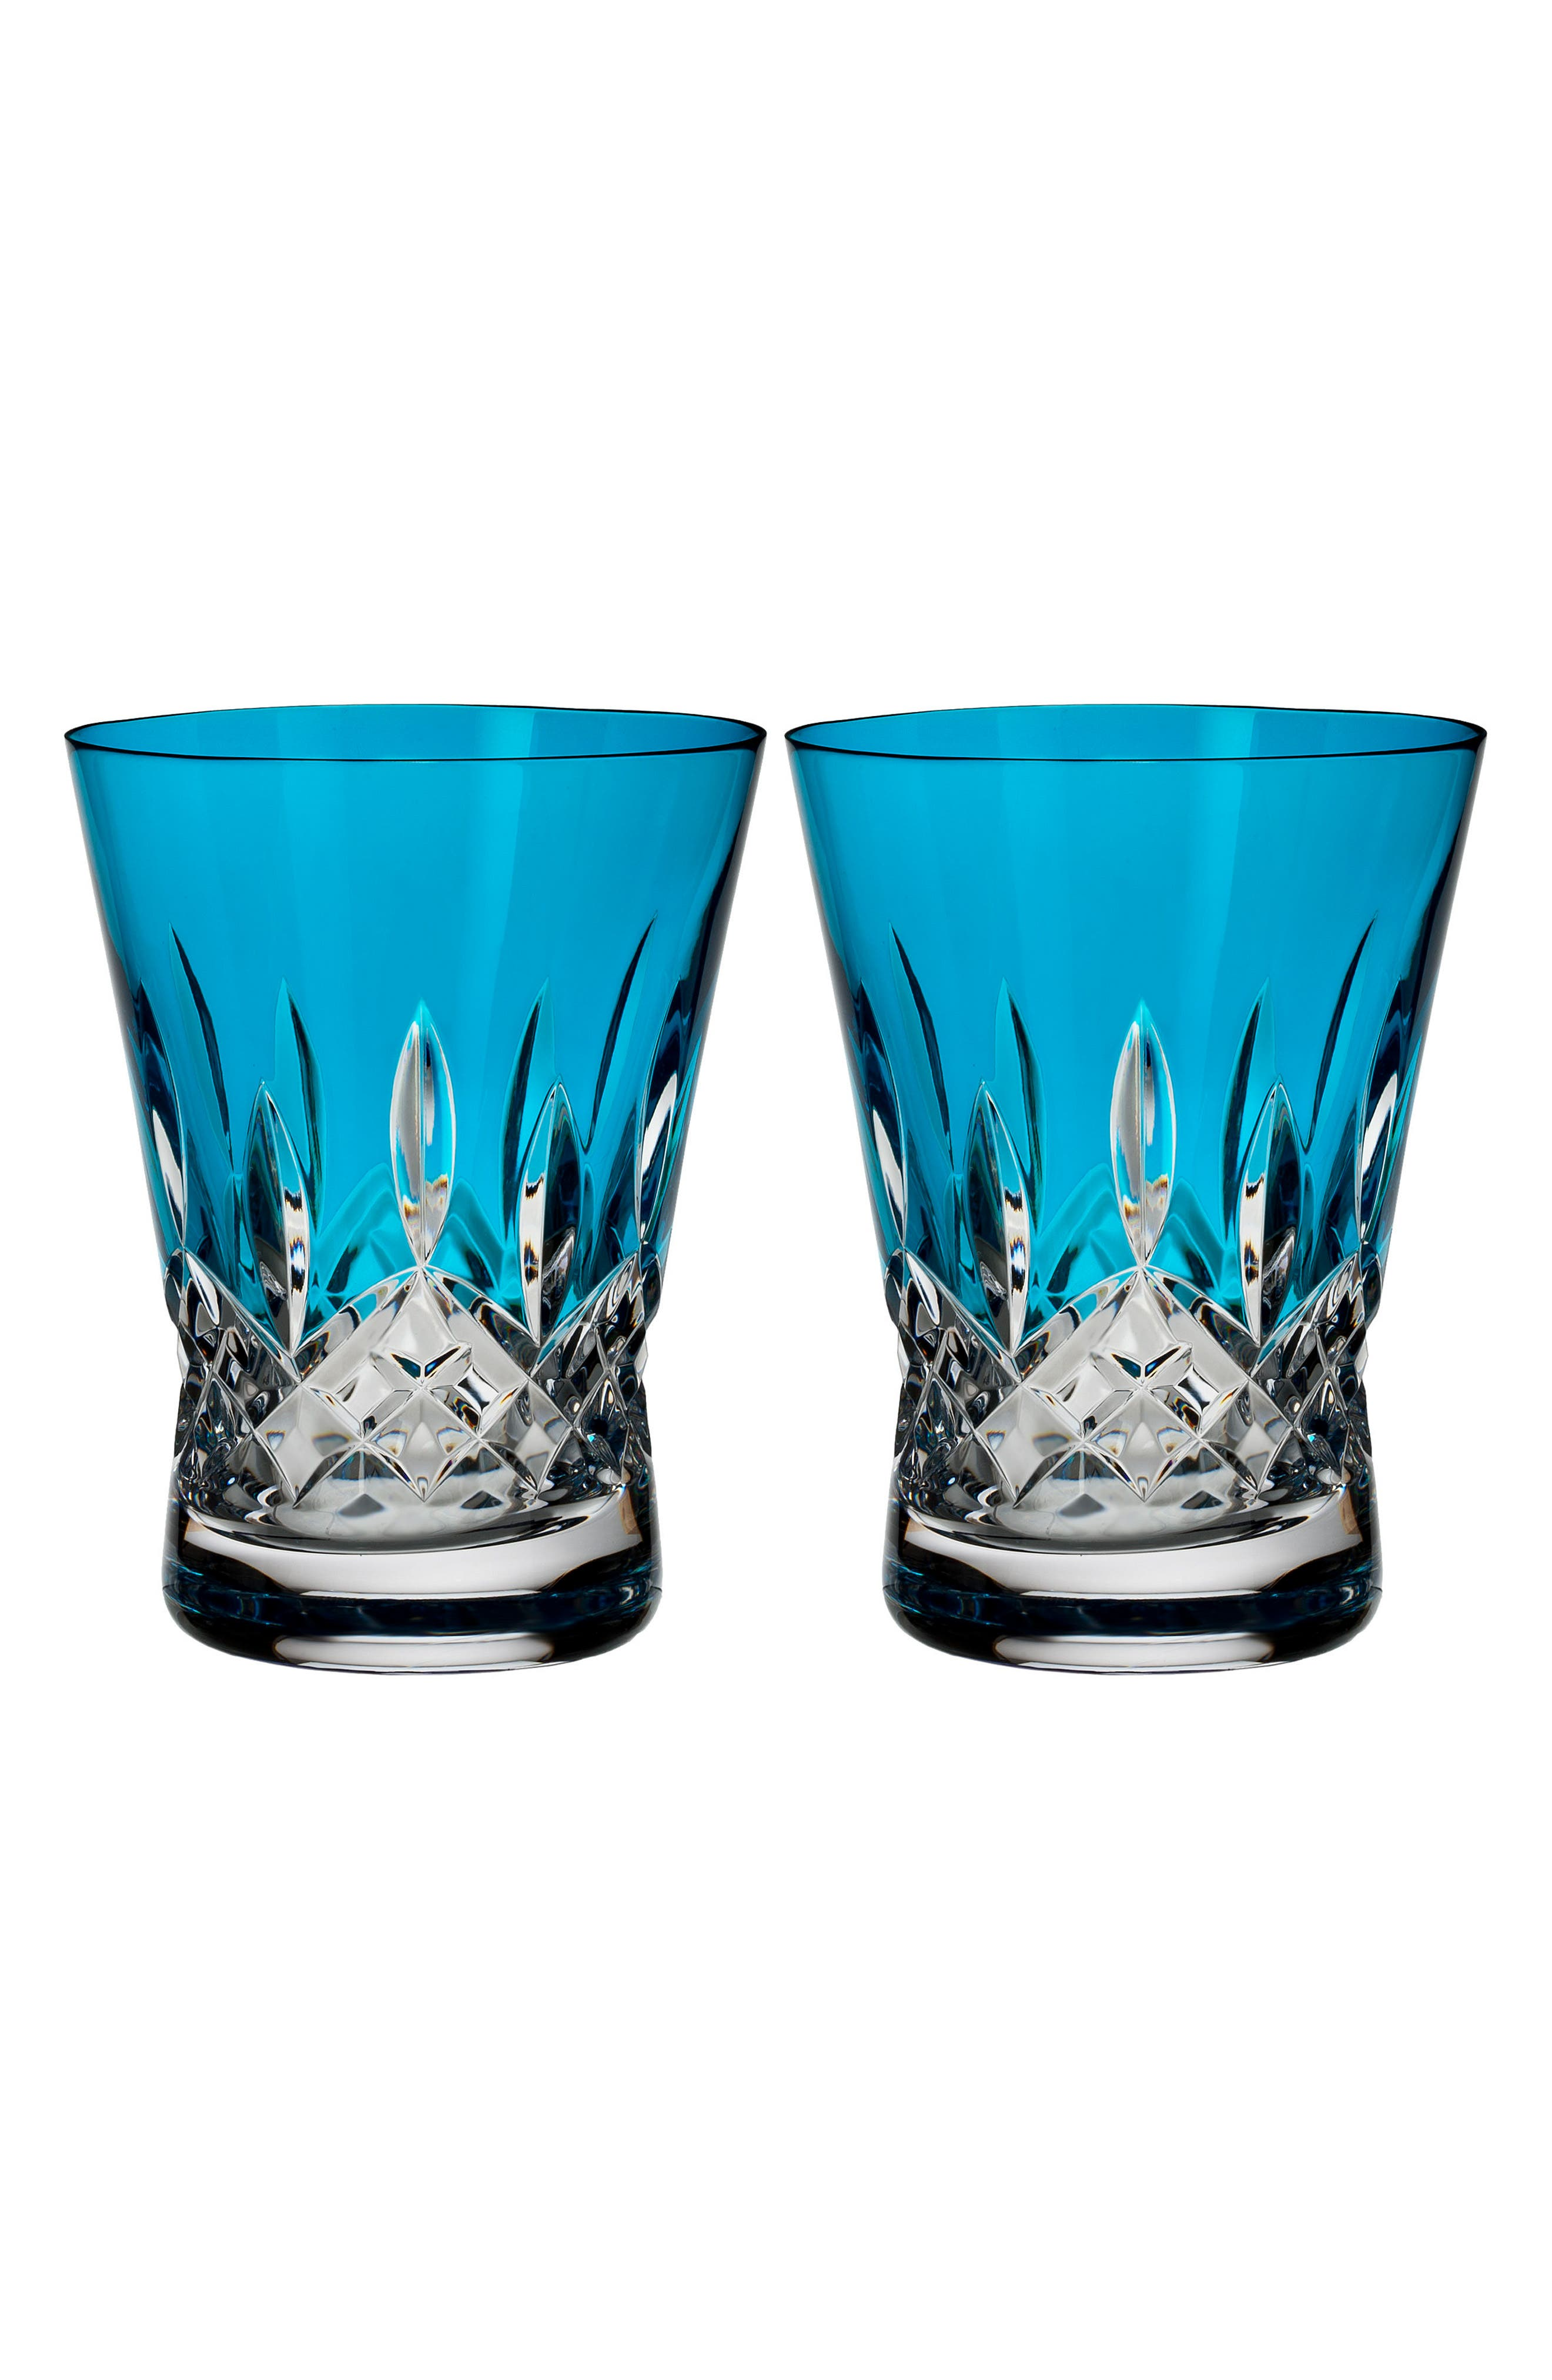 Lismore Pops Set of 2 Aqua Lead Crystal Double Old Fashioned Glasses,                         Main,                         color, 100